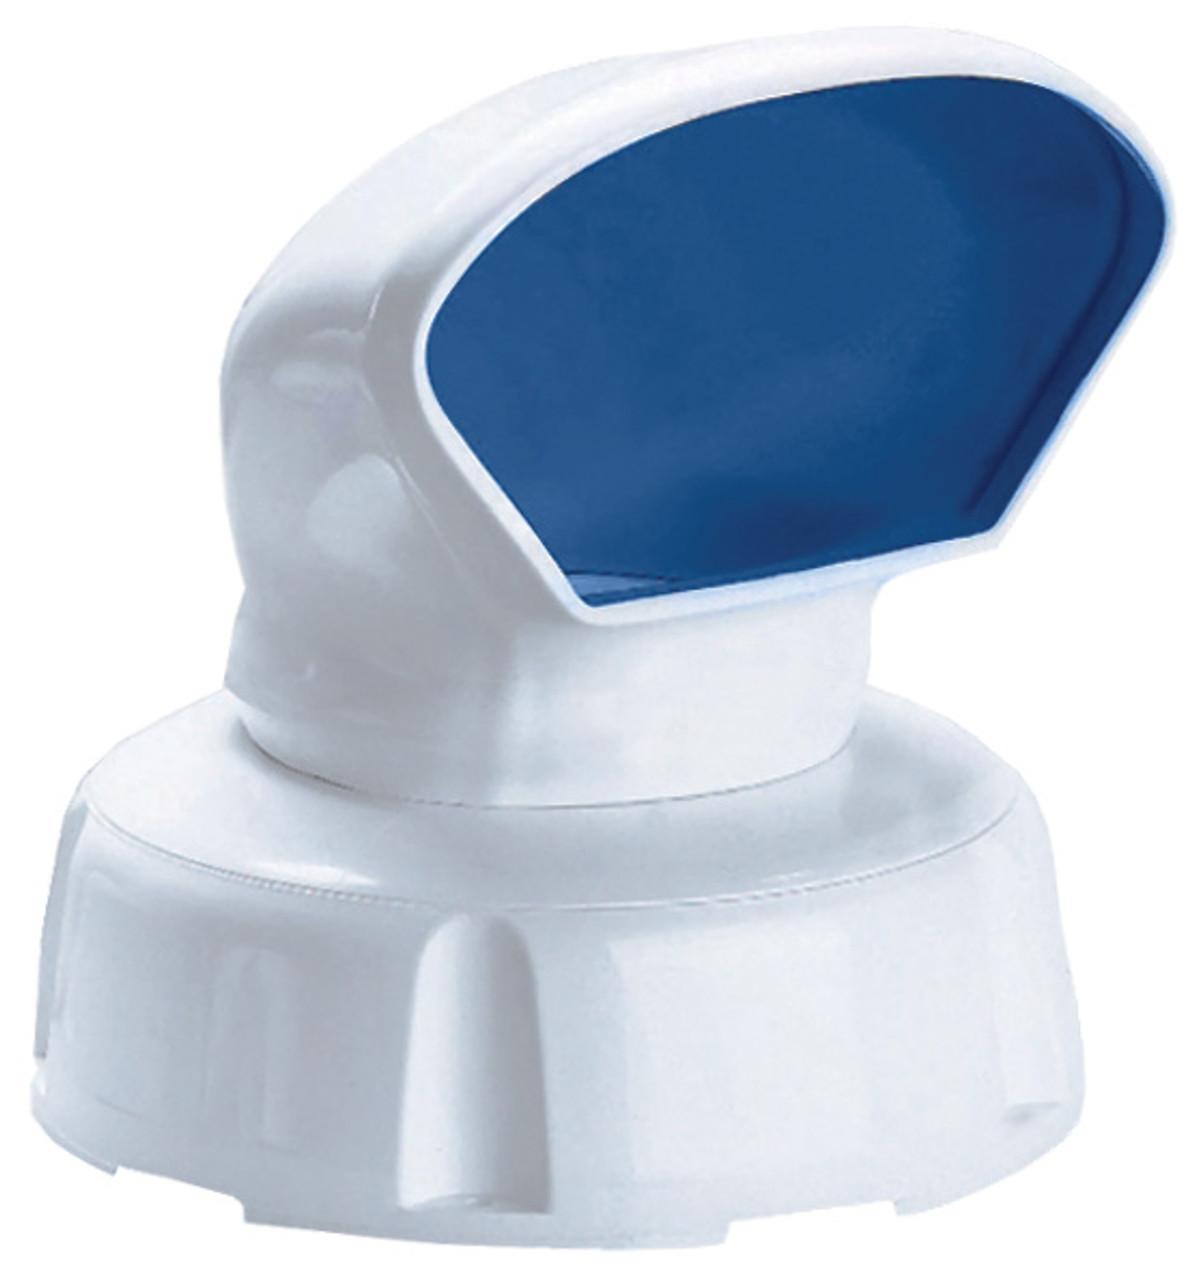 Cool n Dry Dorade Box Vents - High profile